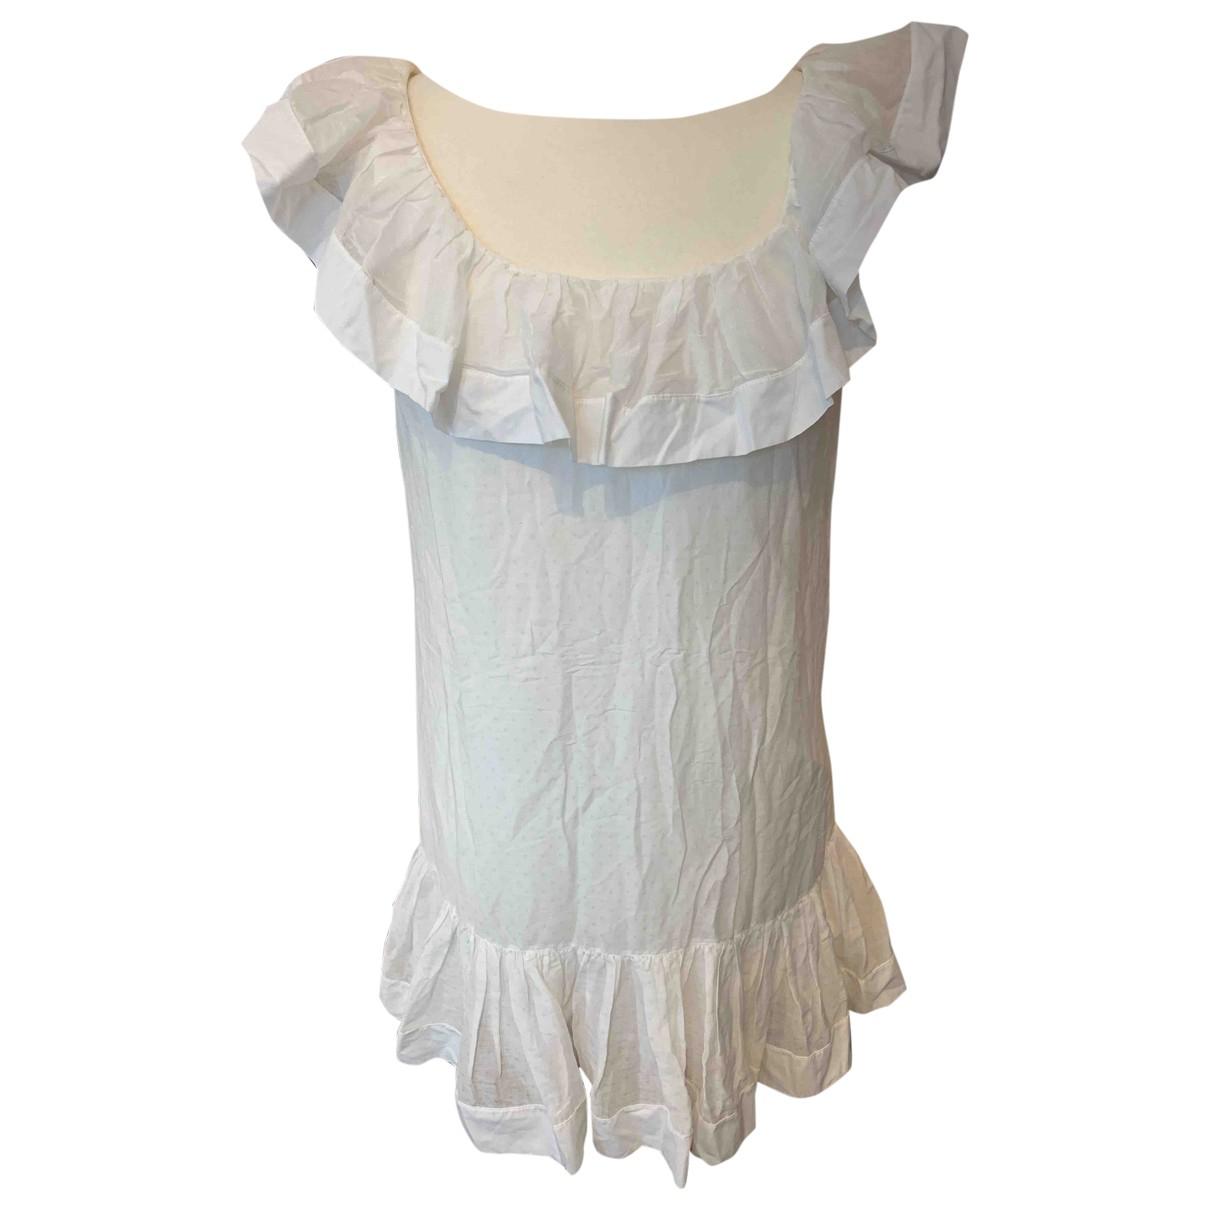 Red Valentino Garavani N White Cotton dress for Women 10 UK